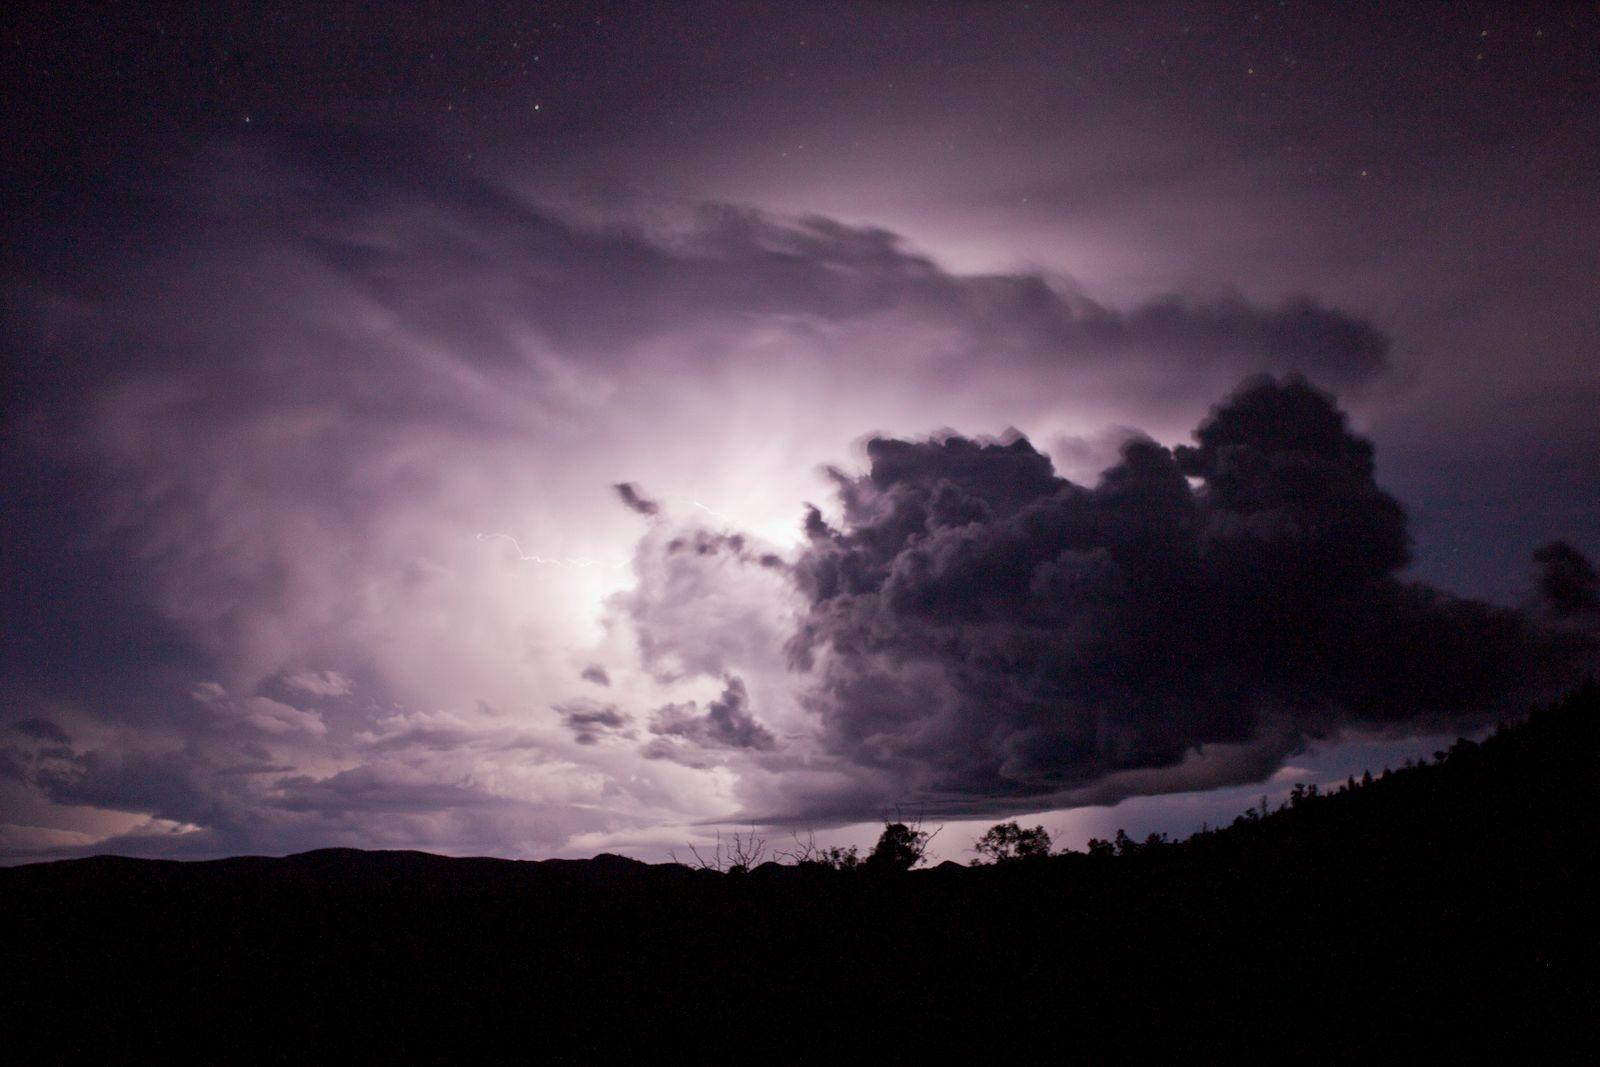 Lightning flash behind a cloud at night